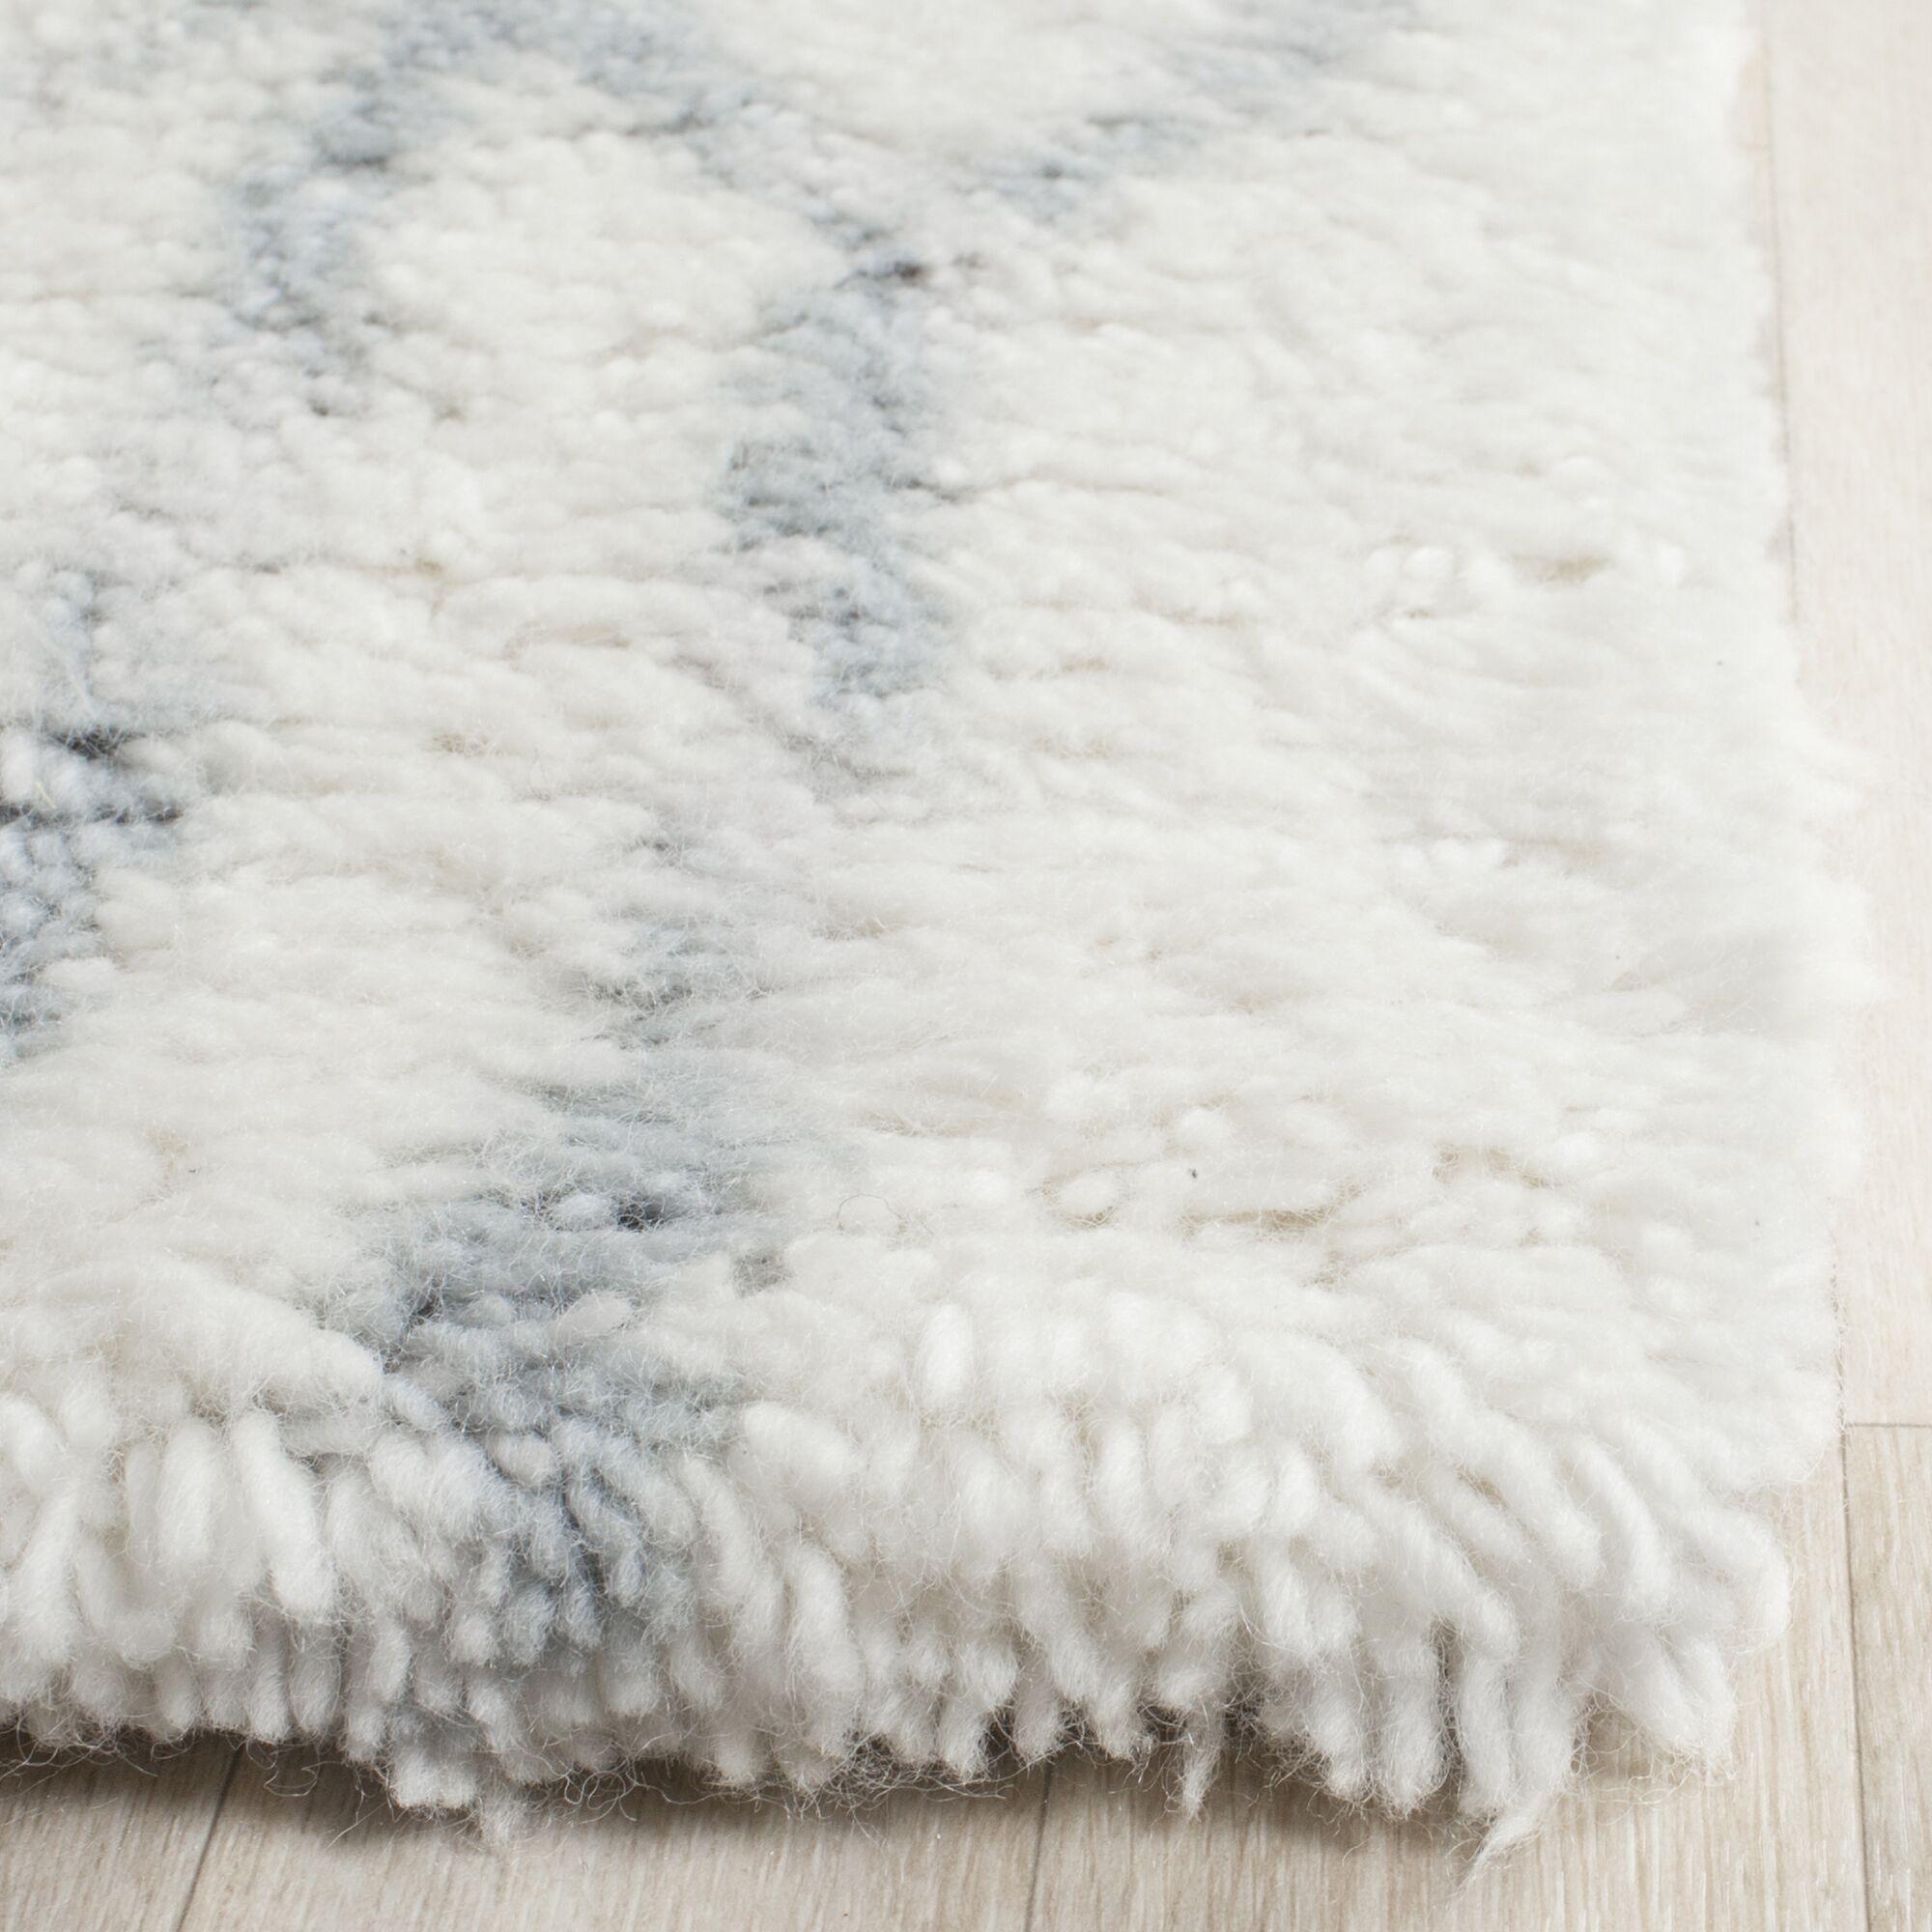 Camacho Hand-Tufted Ivory/Blue Area Rug Rug Size: Rectangle 8' x 10'